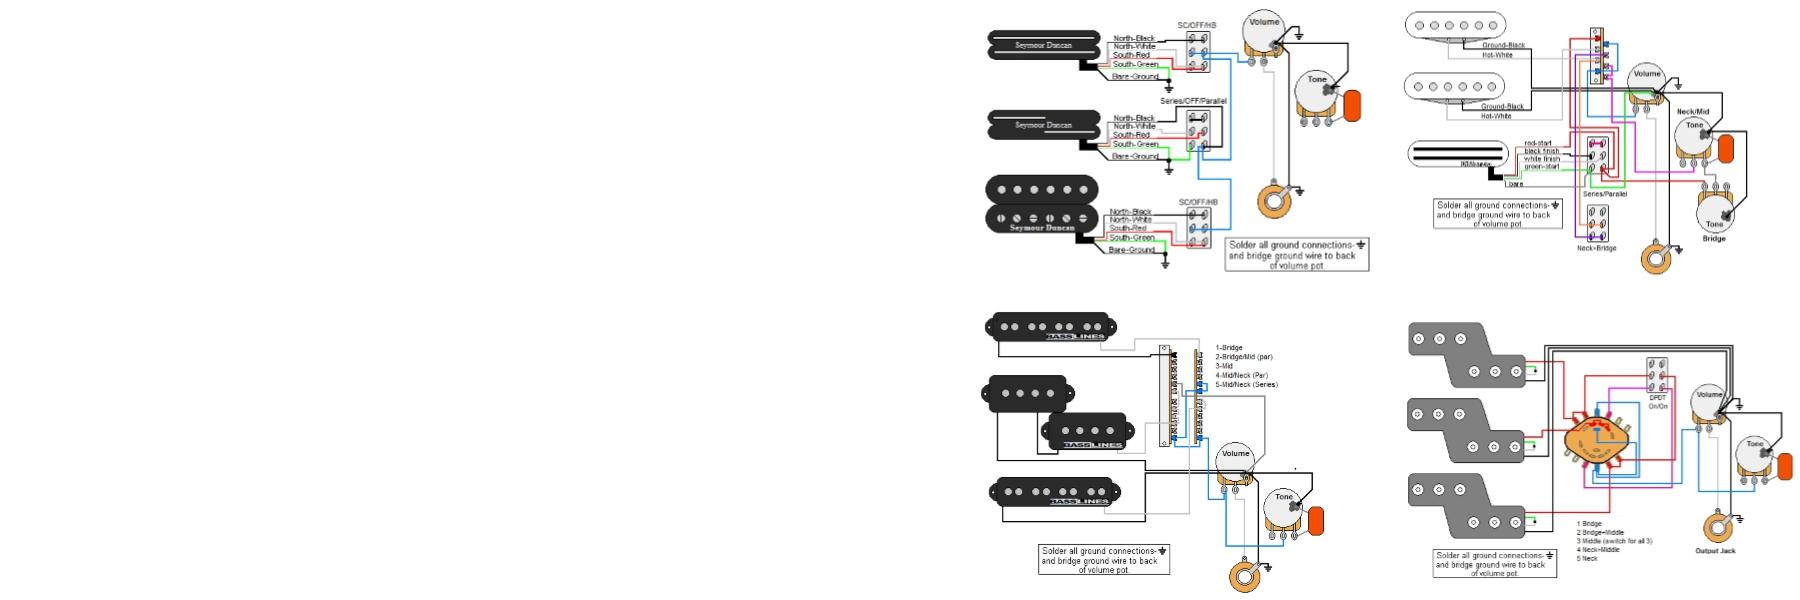 guitar electronics parts wiring diagrams. Black Bedroom Furniture Sets. Home Design Ideas